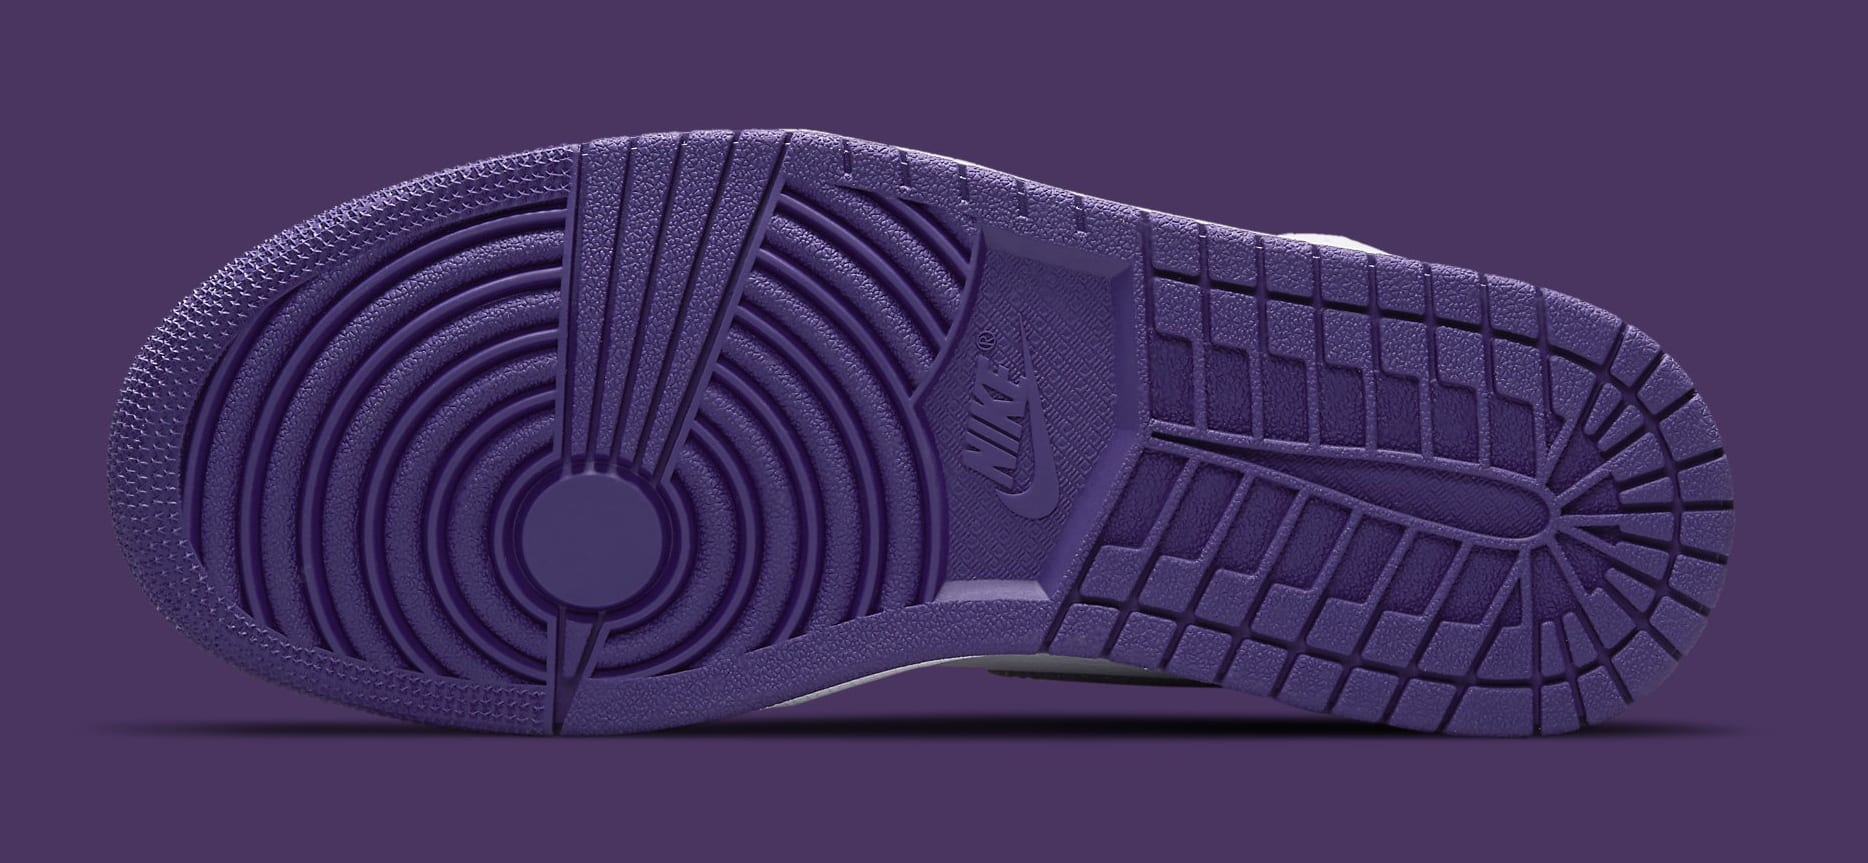 Air Jordan 1 Retro High OG Women's 'Court Purple' CD0461-151 Outsole